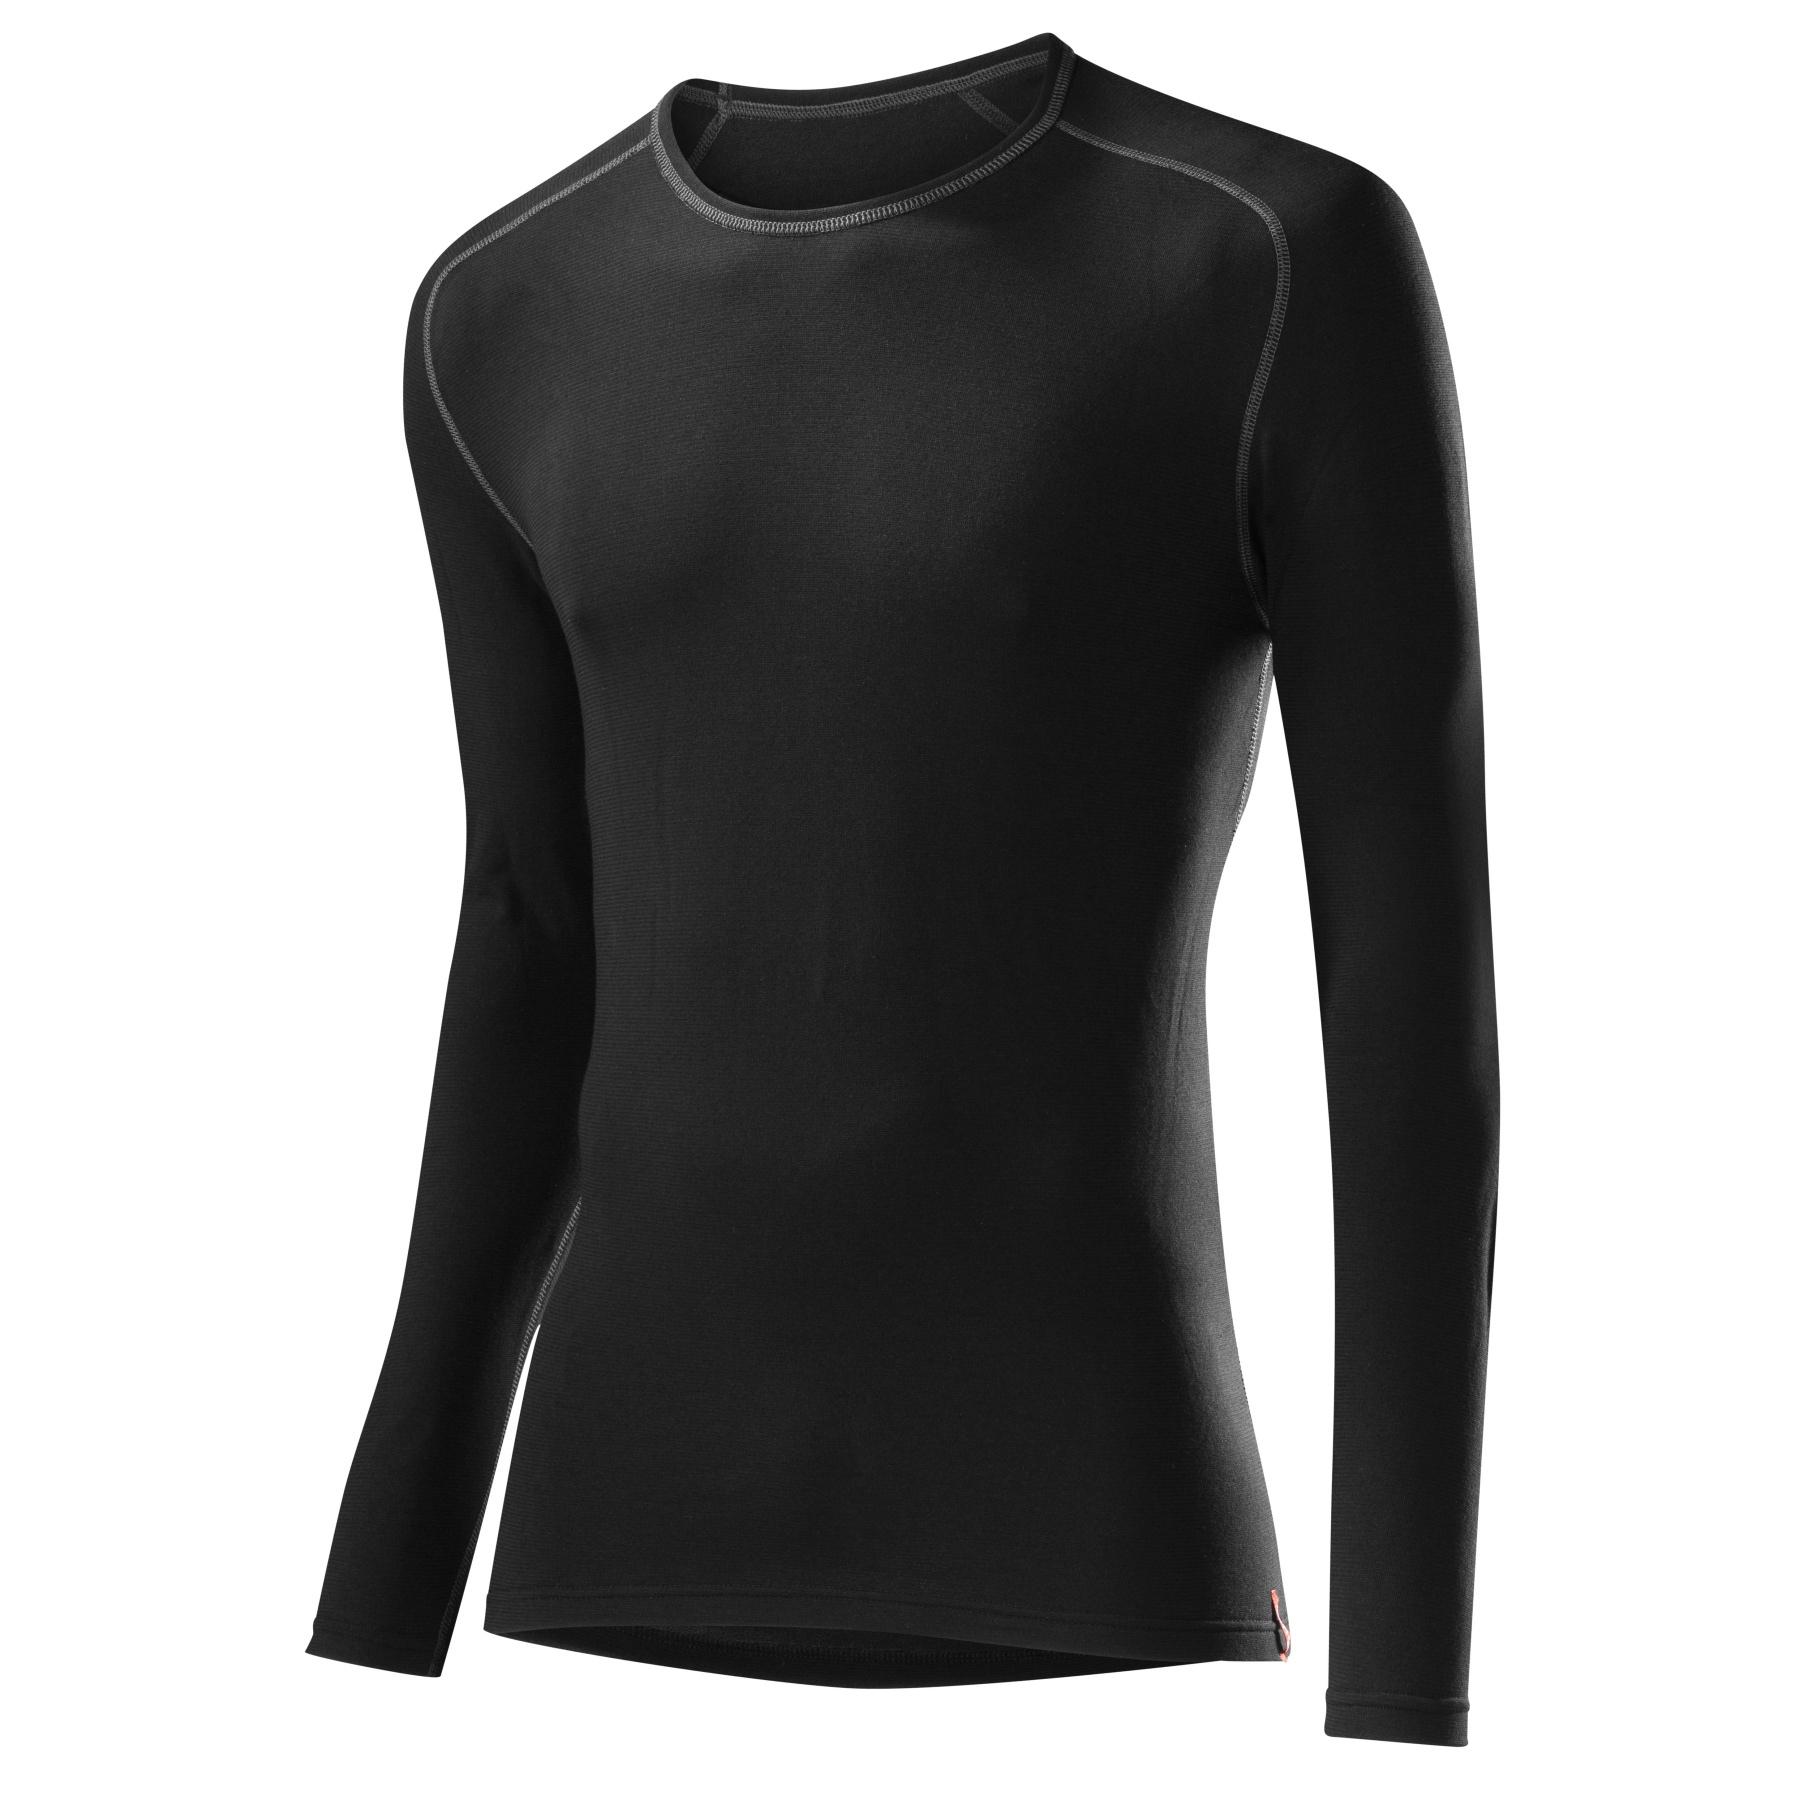 Löffler Langarm-Shirt Unterhemd Transtex Warm 10732 - black 990